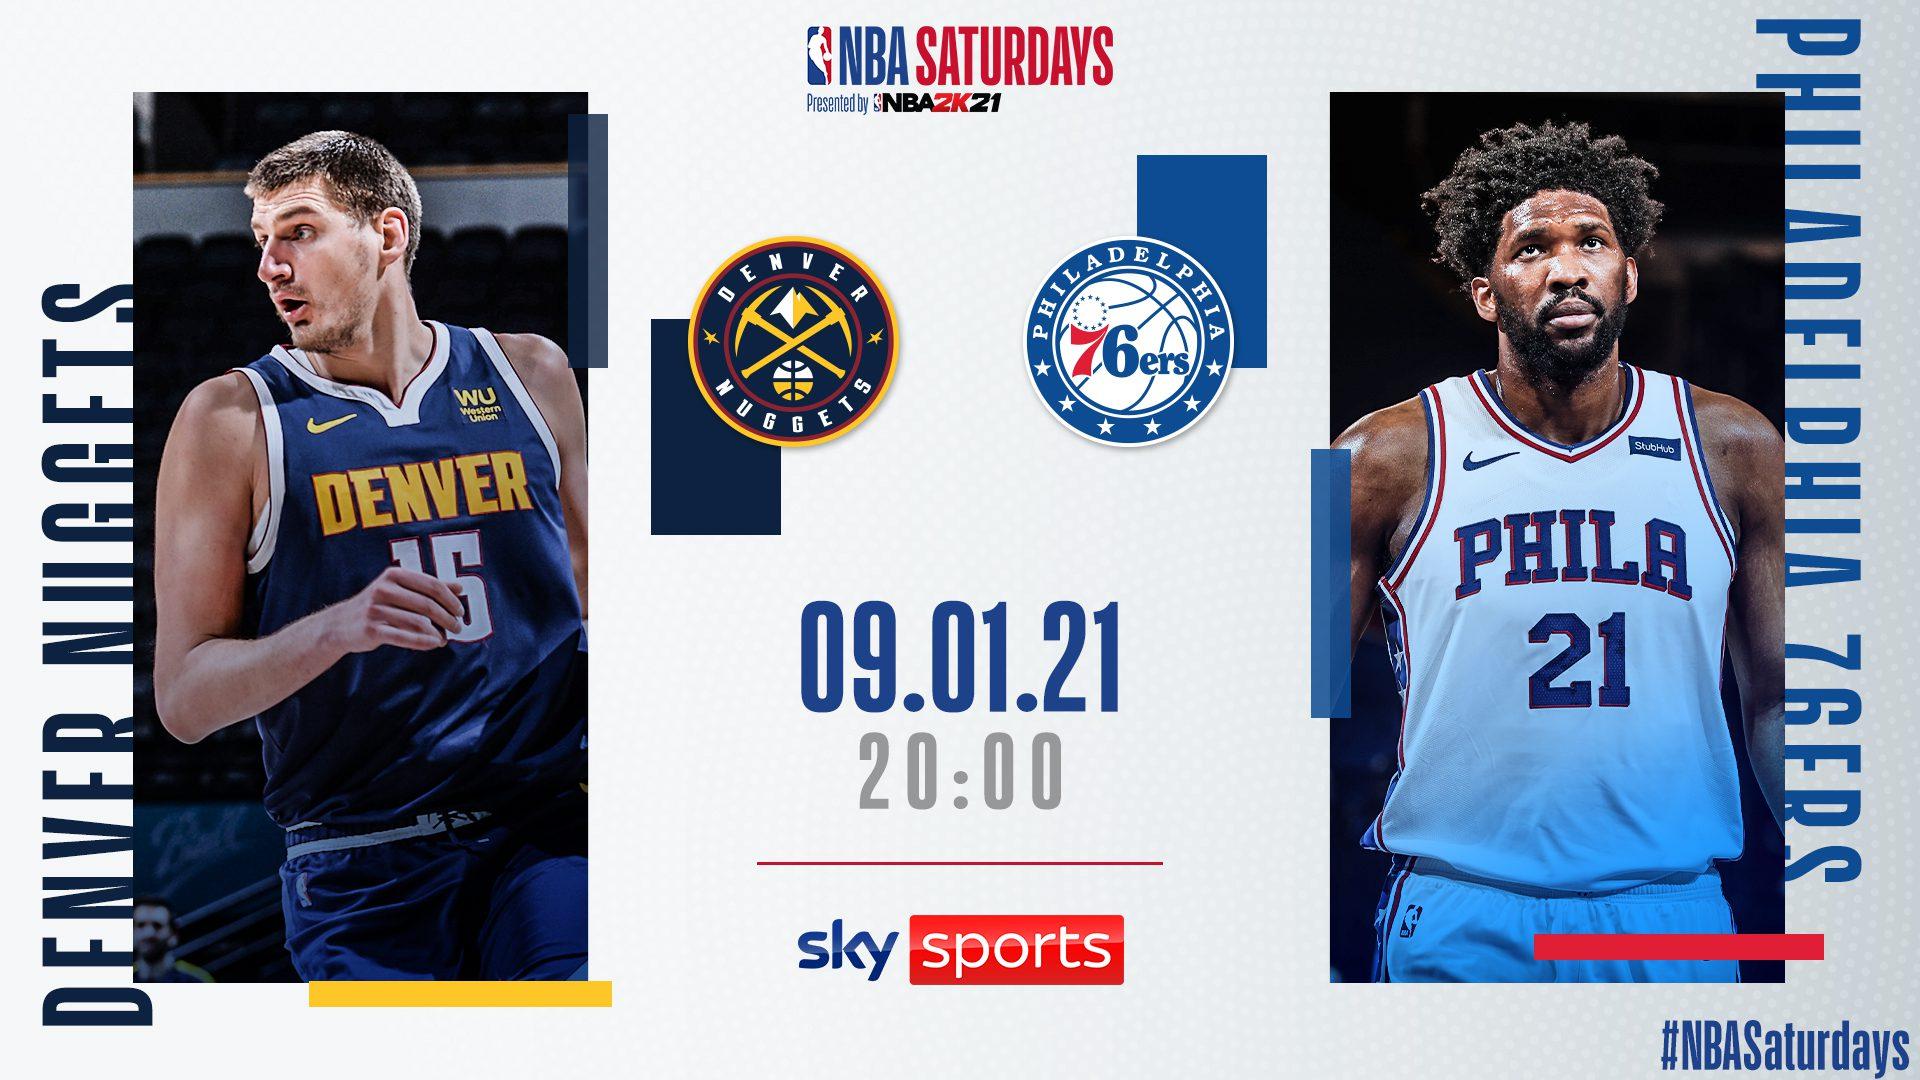 NBA-SAT_Tune-in_GW3-DEN-PHI_16x9_UK